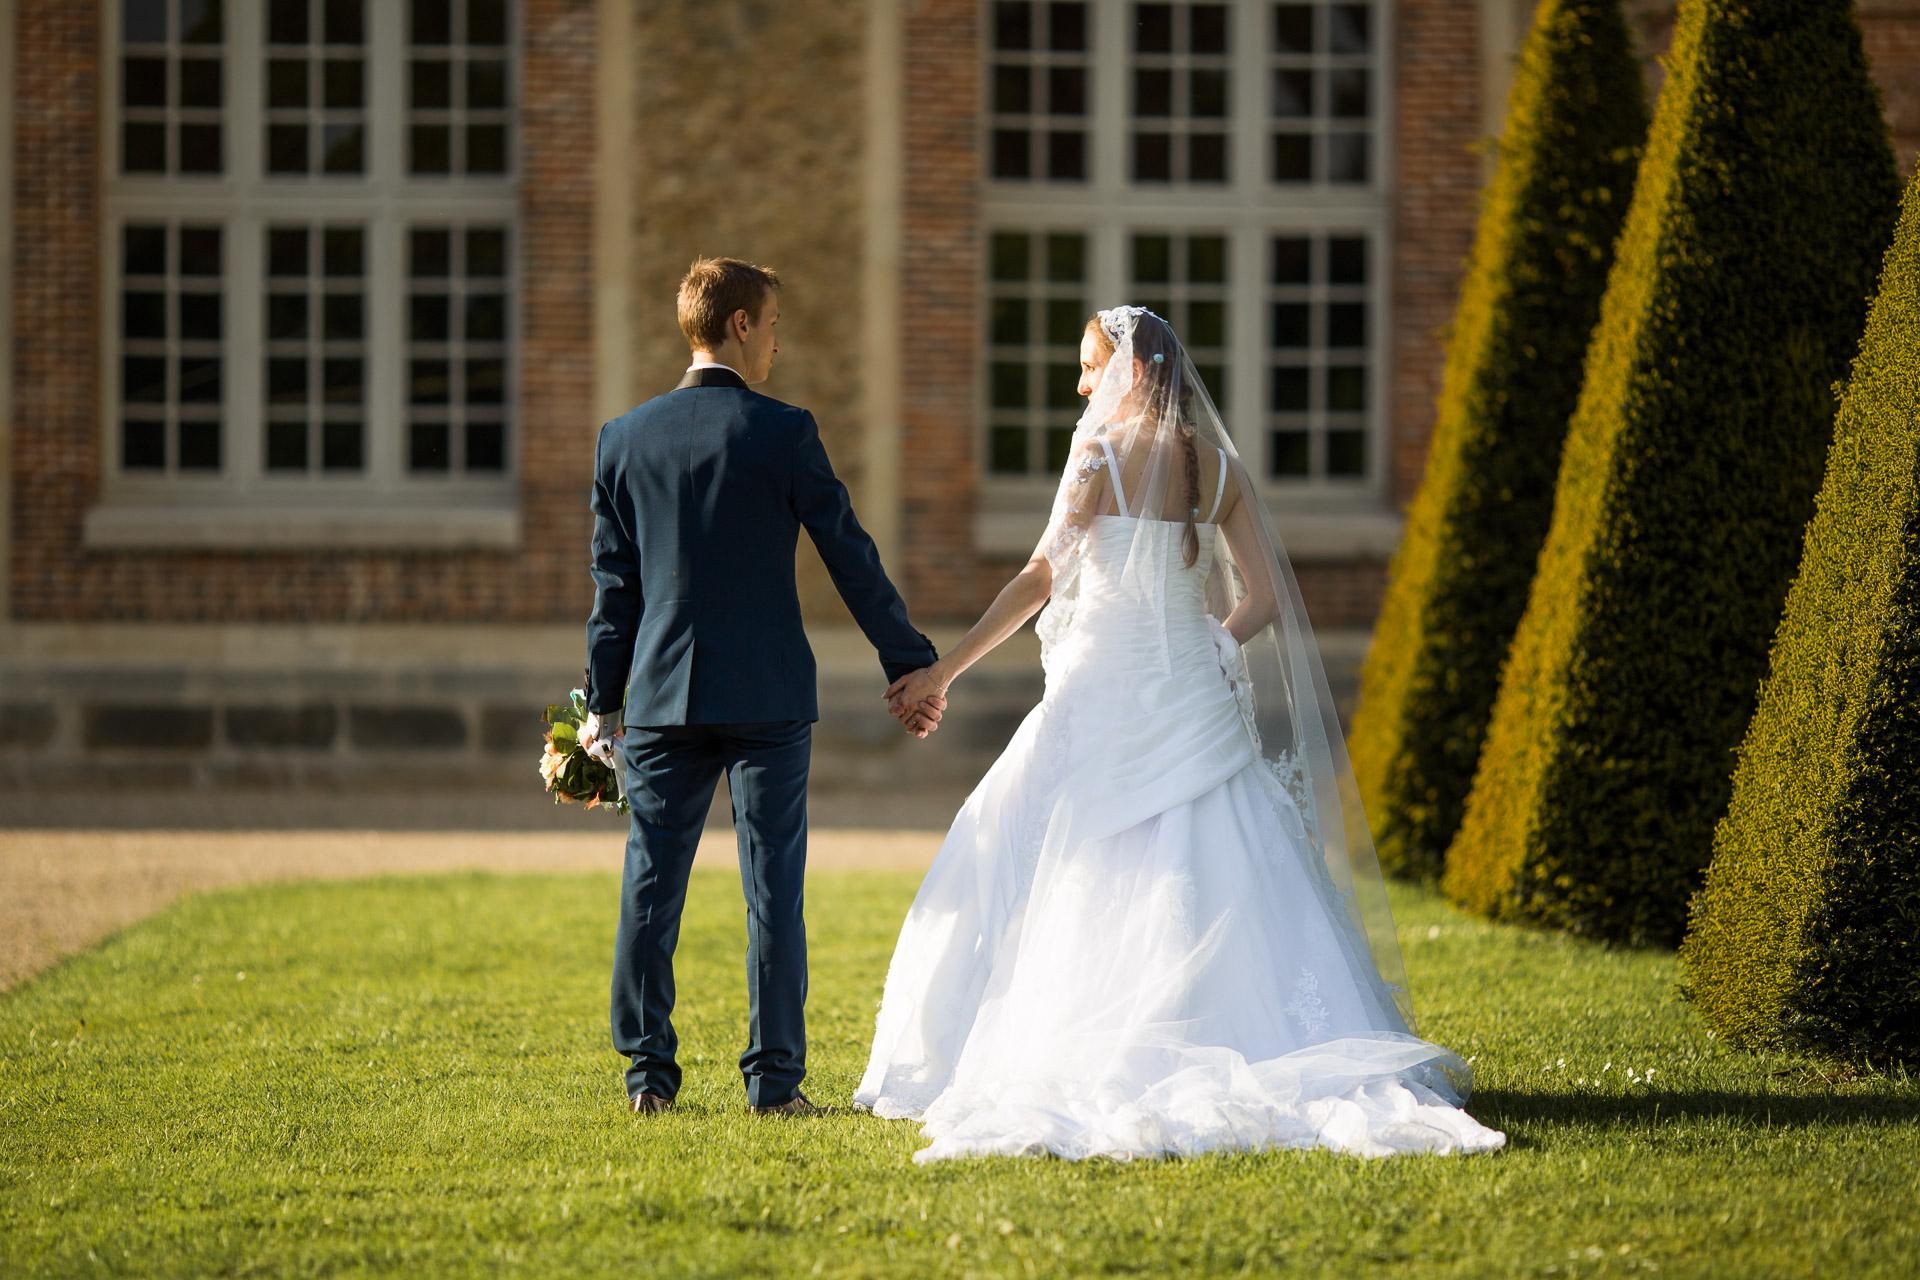 Mon mariage traditionnel venu de loin : le bilan